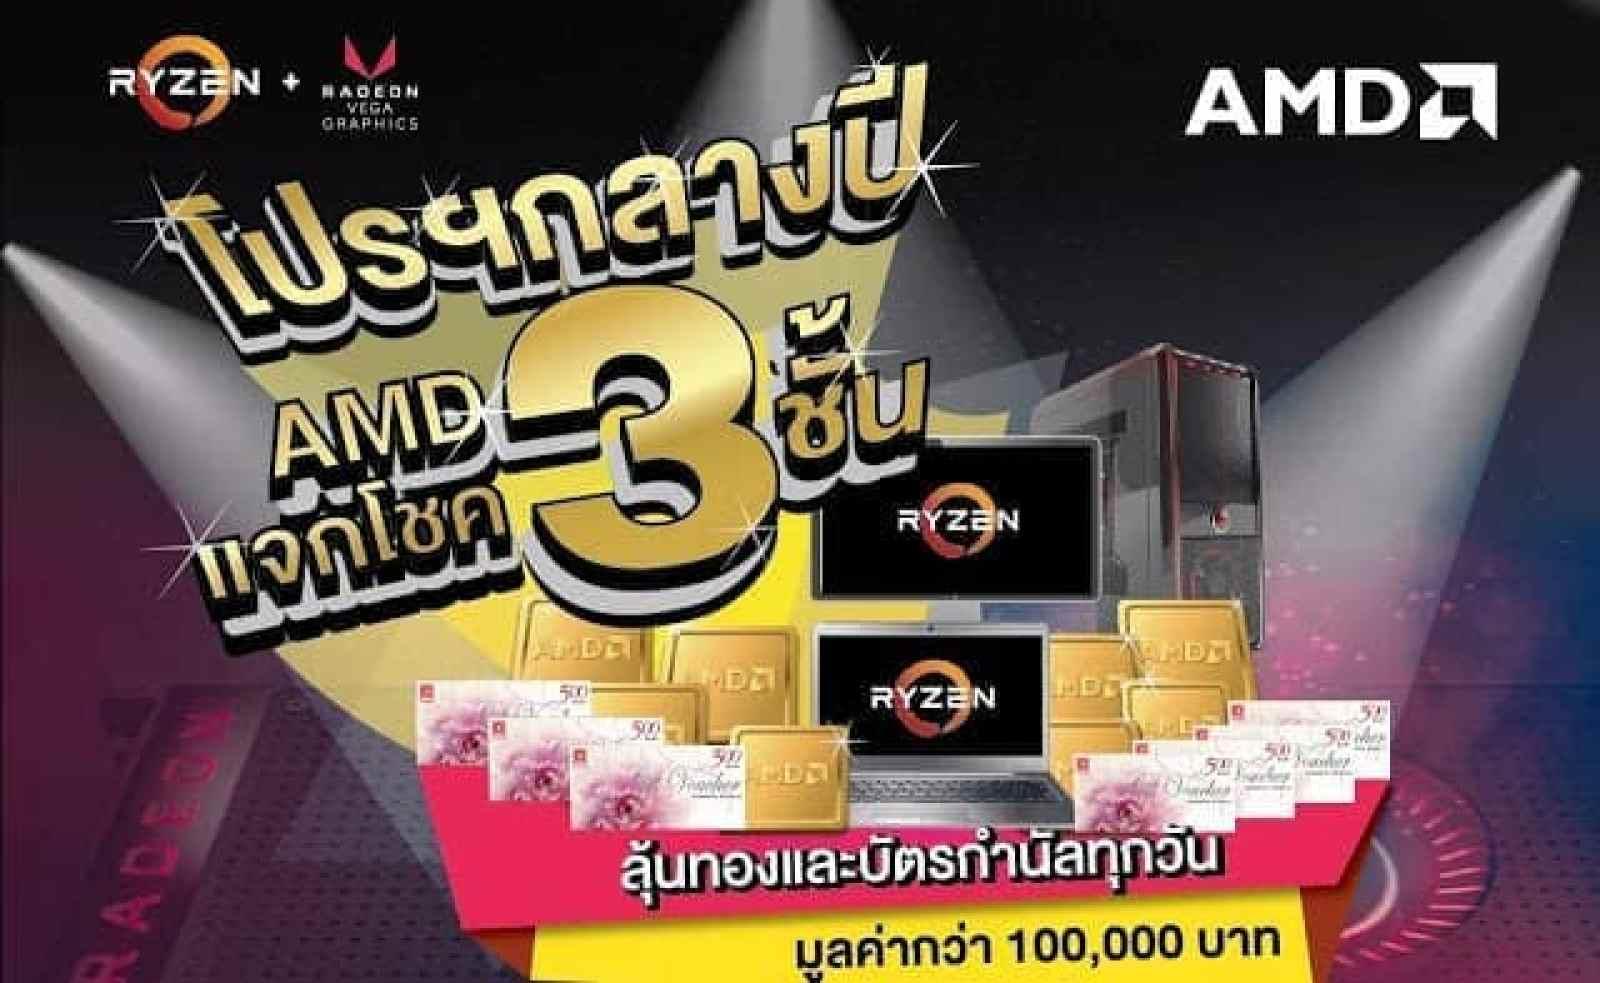 - AMD promotion 3 4 - AMD แจกโชค 3 ชั้นที่งานคอมมาร์ทเท่านั้น‼ ลุ้นทองและบัตรกำนัลทุกวัน มูลค่ากว่า 100,000 บาท